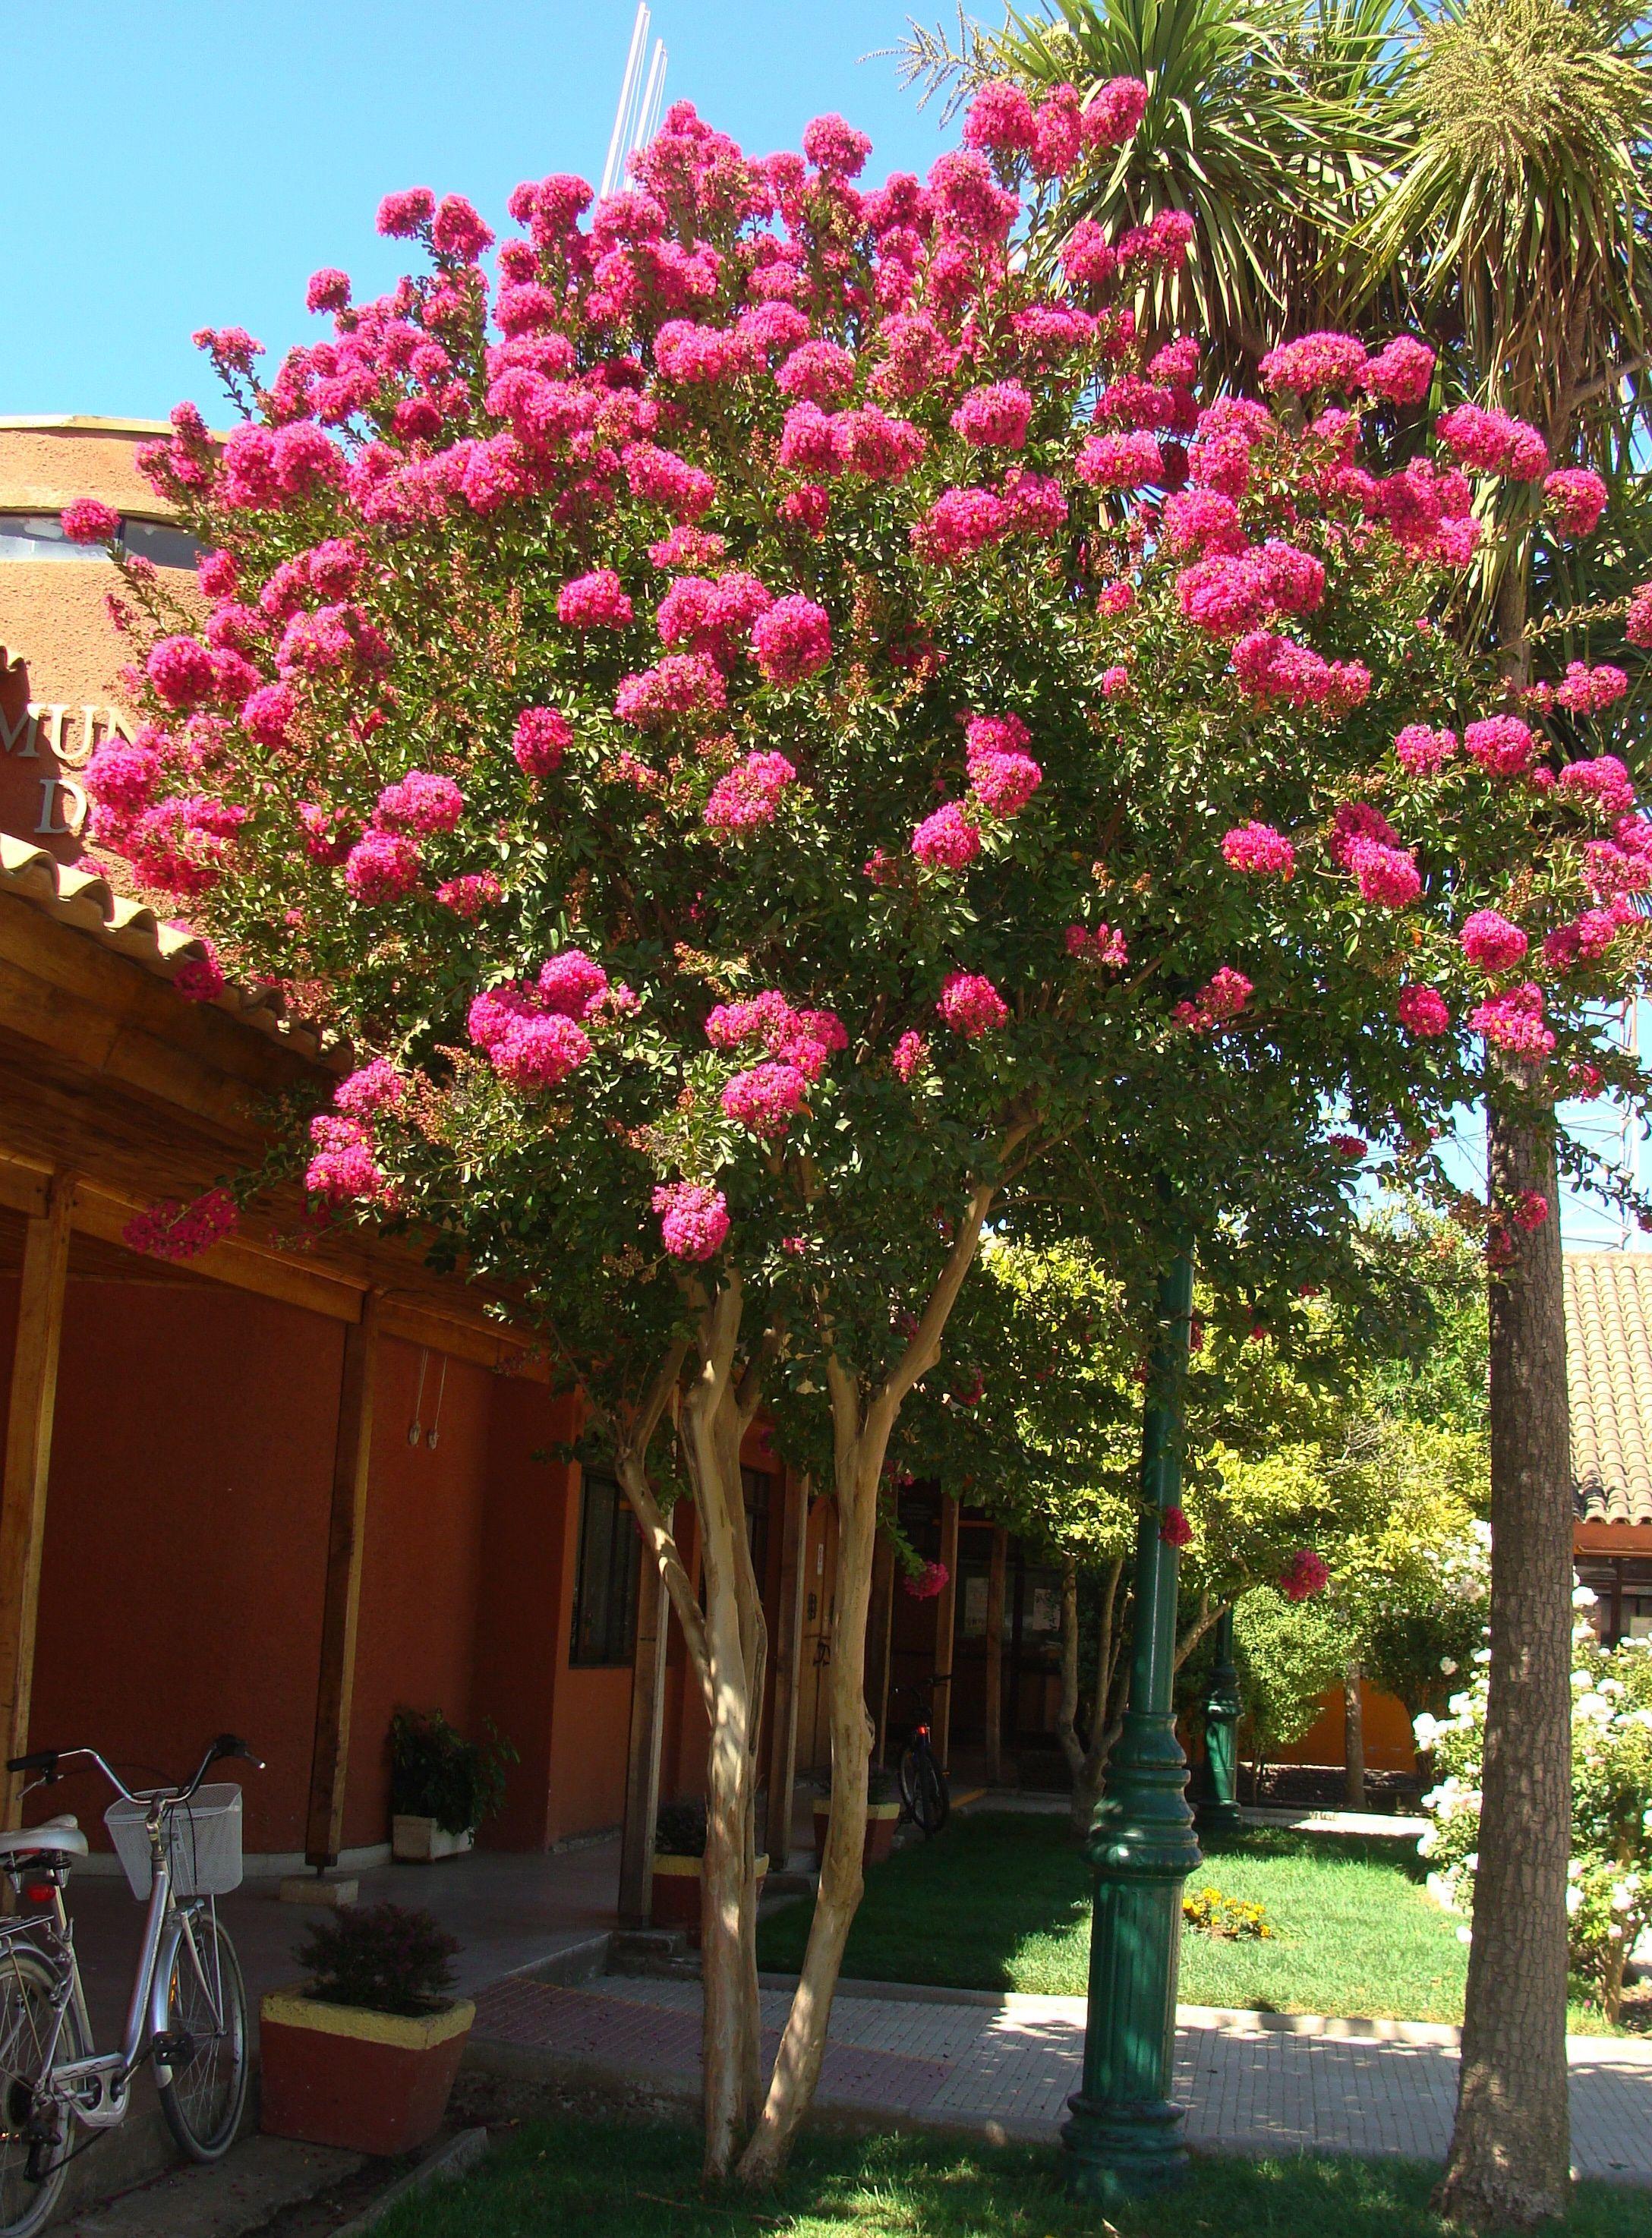 Crespon jardiner a pinterest cresp n arboles for Arboles de flores para jardin